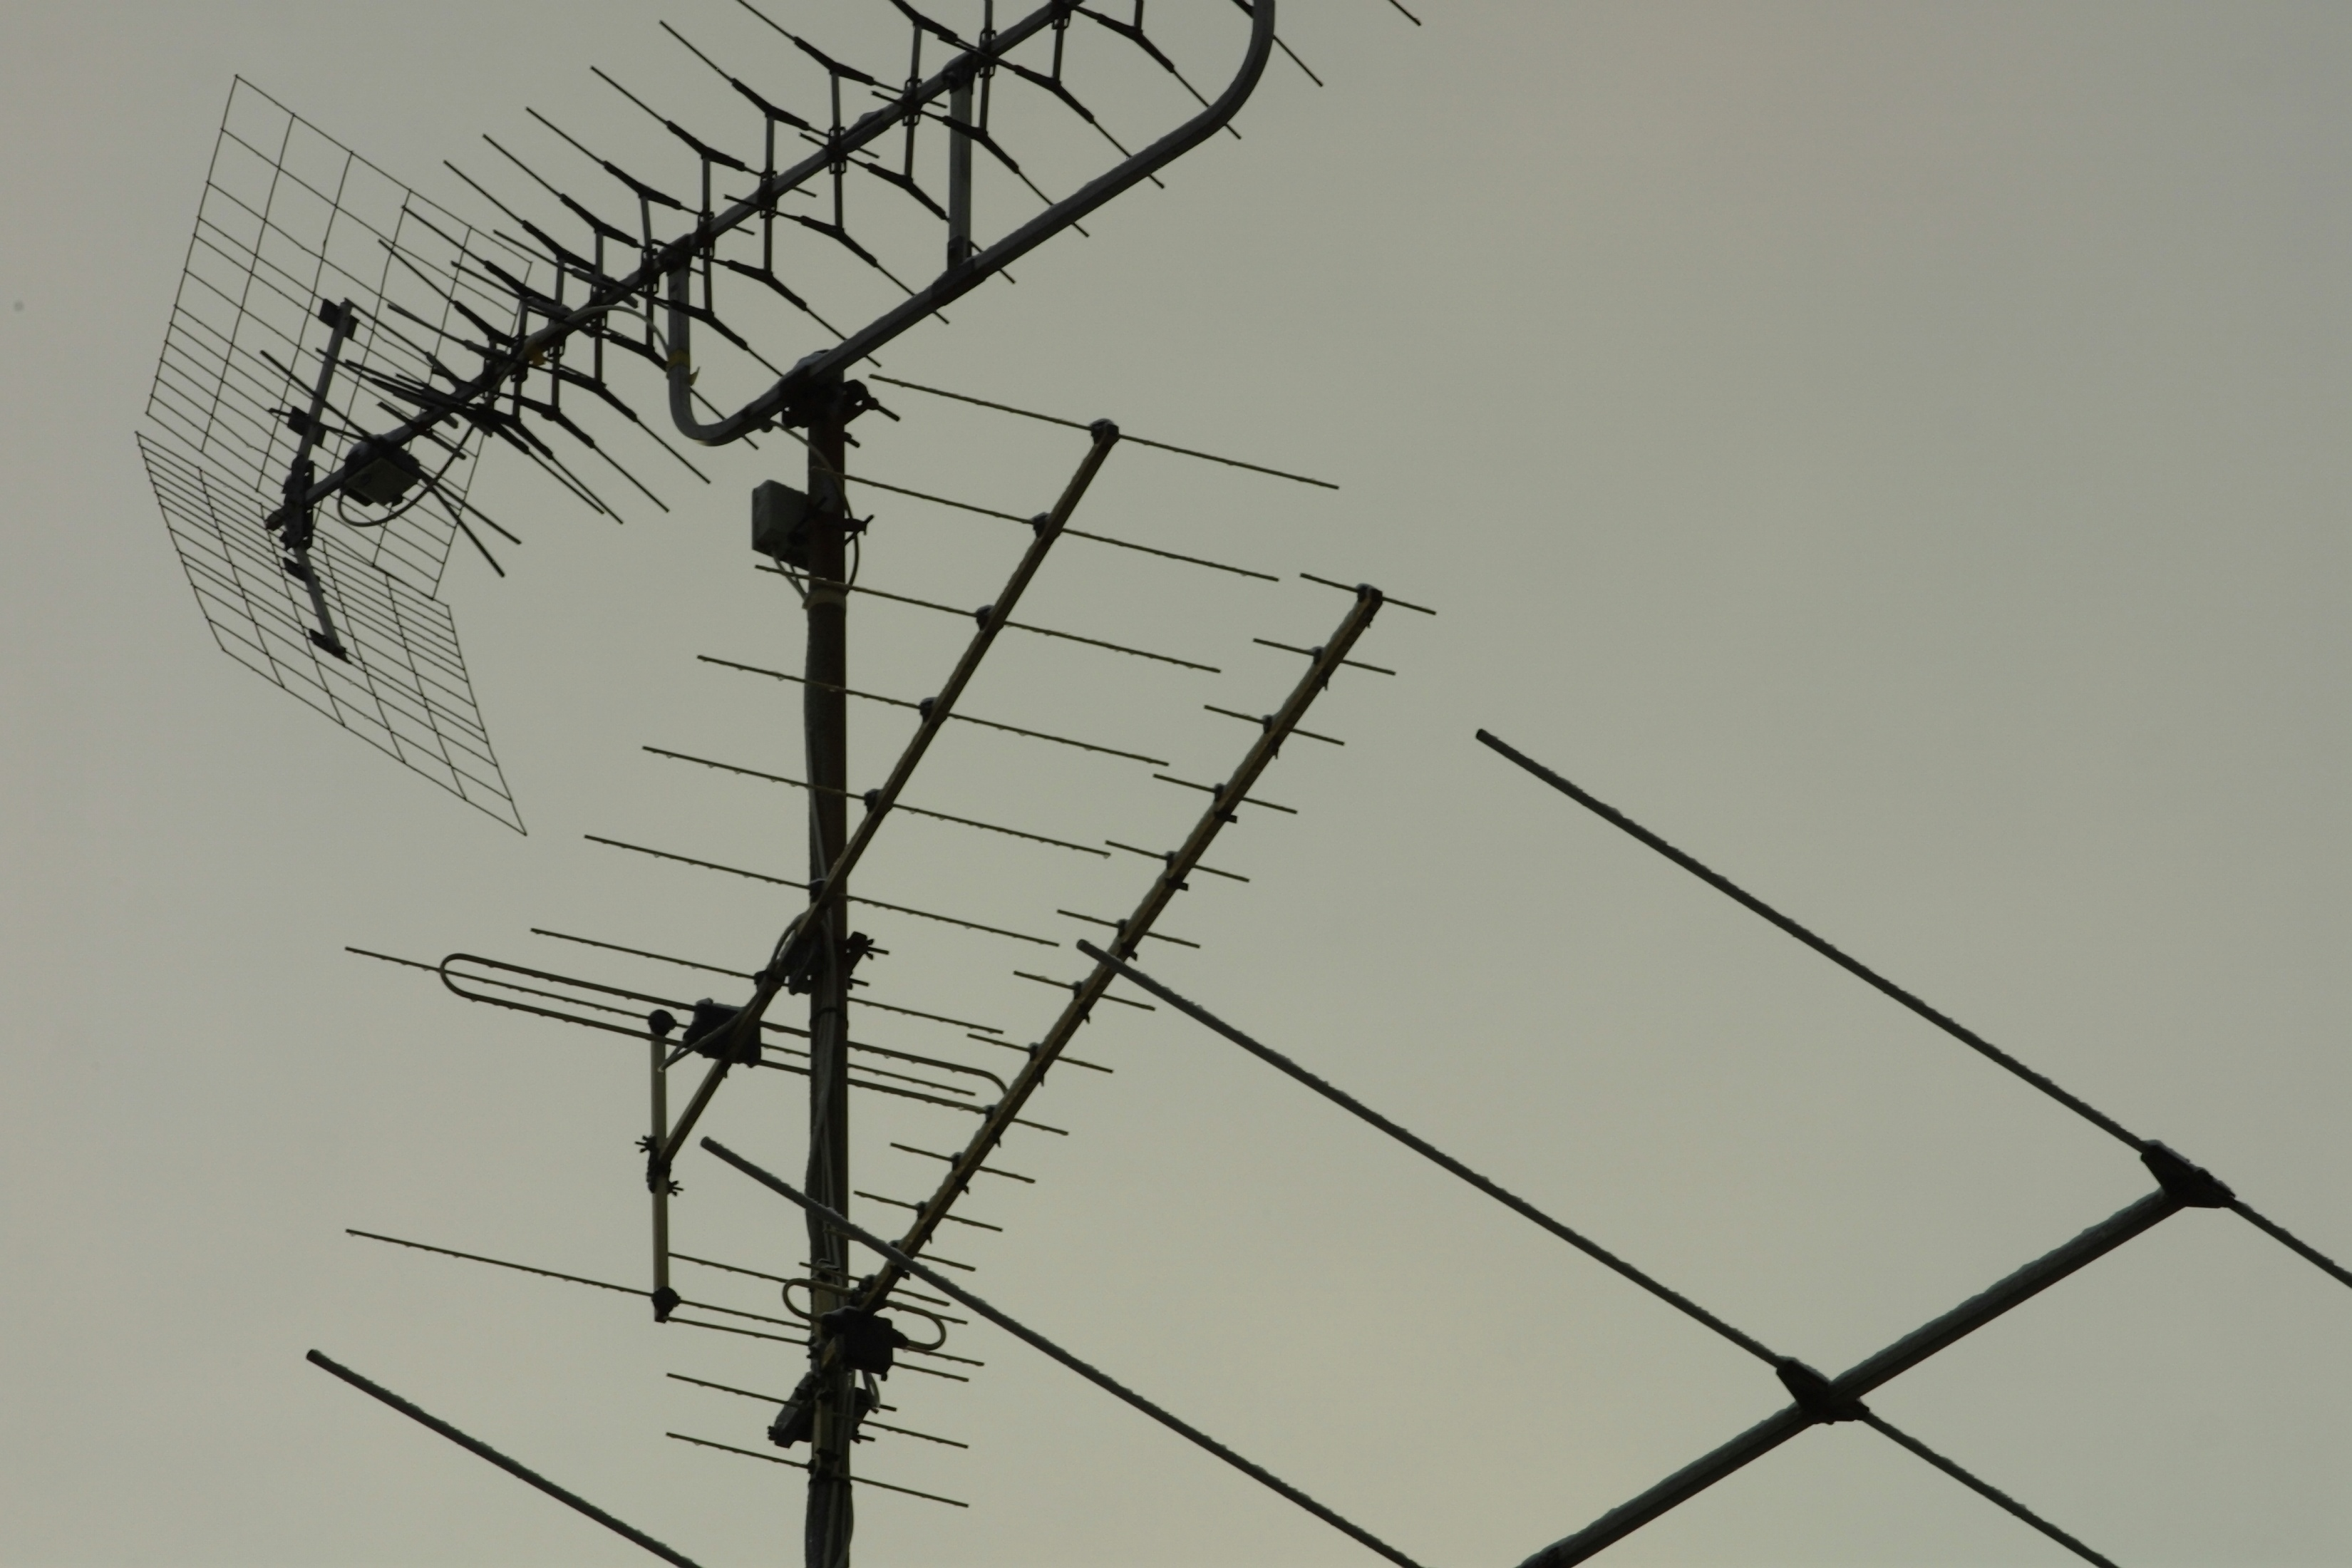 ClearView HDTV Antenna: Indoor 50 Mile Range Signal Amplifier?